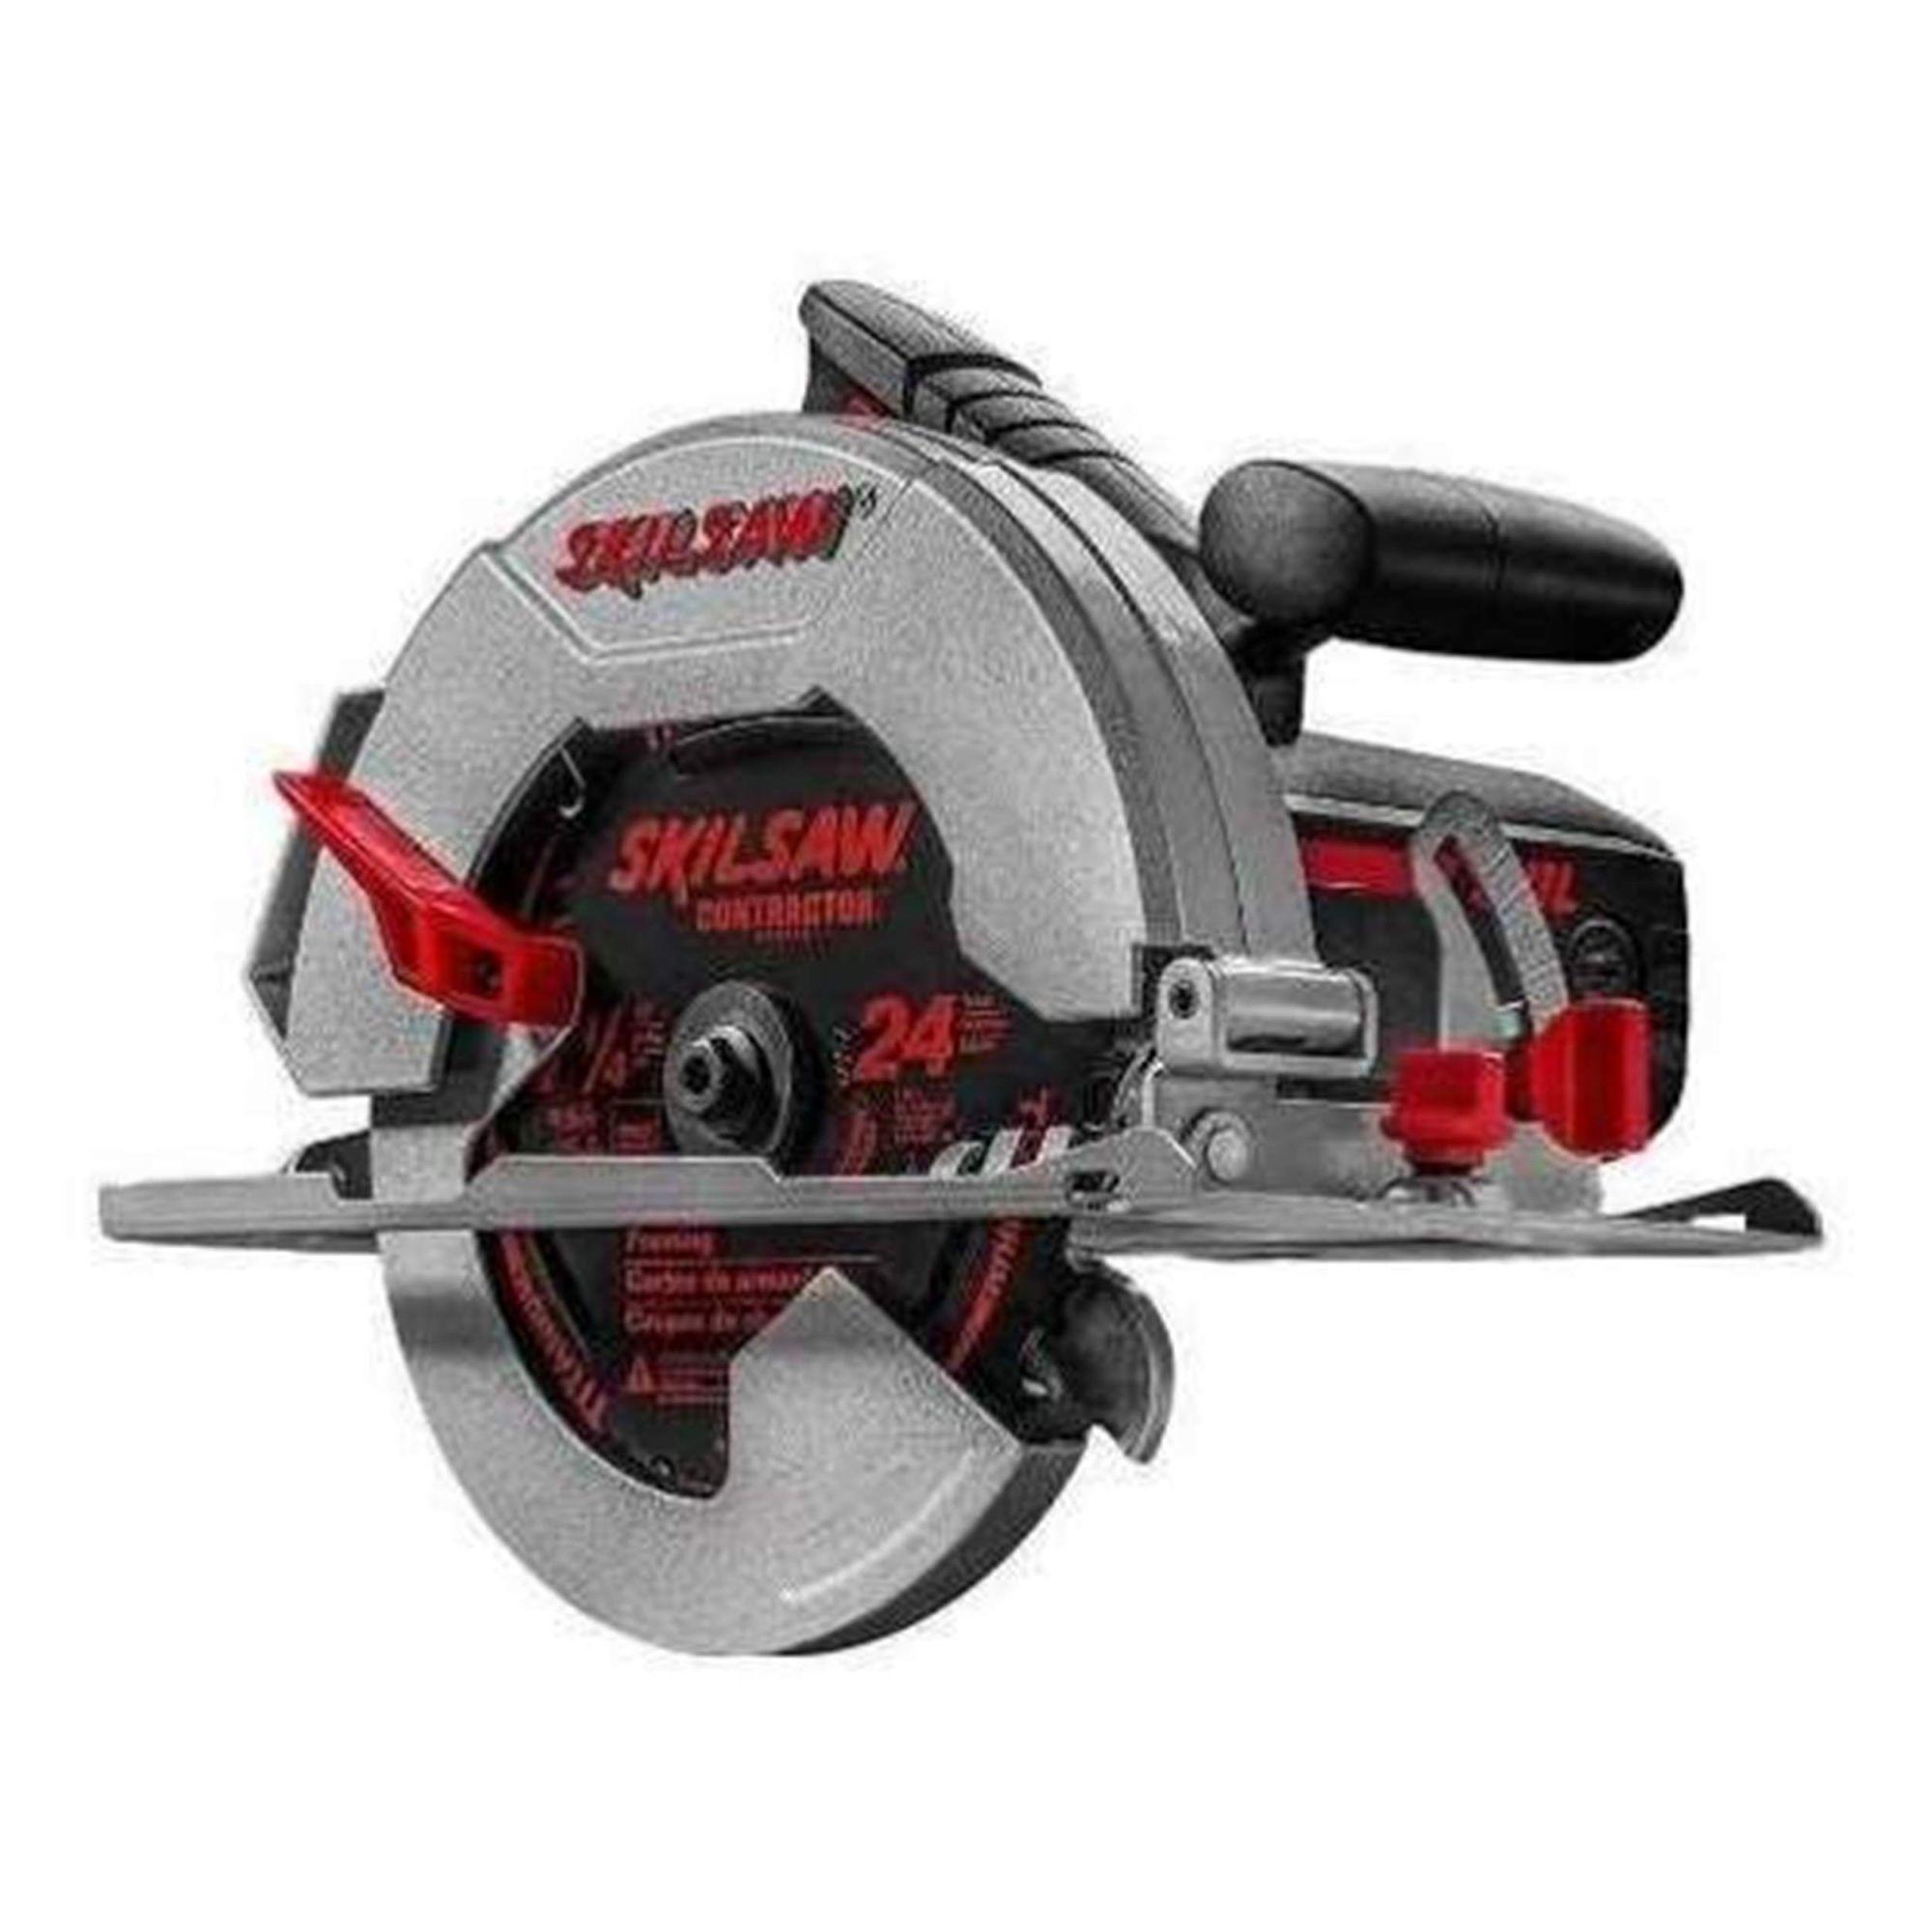 Serra Circular 7.1/4'' Profissional 1.400w Skil Com Disco